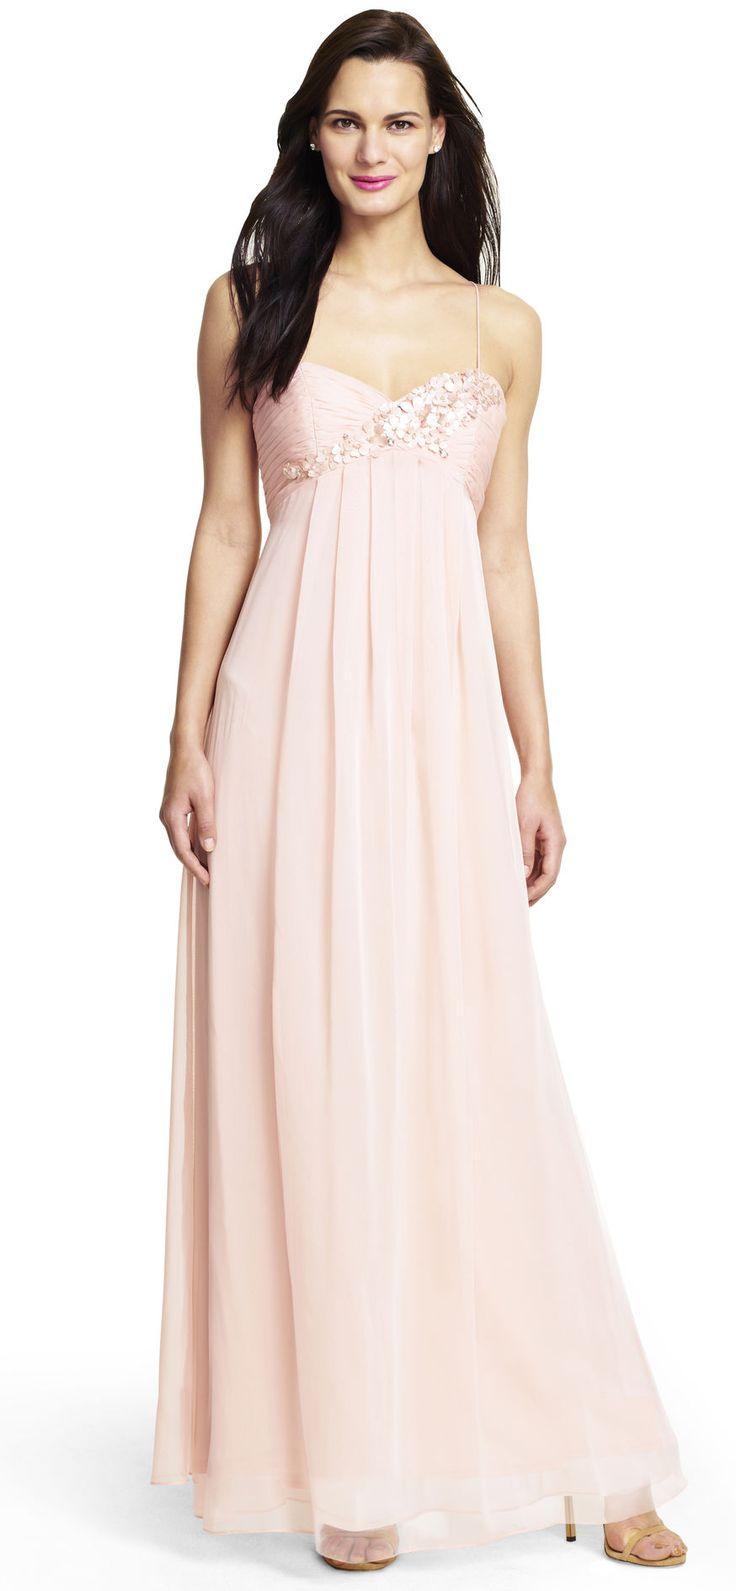 119 best bridesmaid dresses images on pinterest bridesmaid ideas flower applique chiffon gown pink bridesmaid dressesblush ombrellifo Images